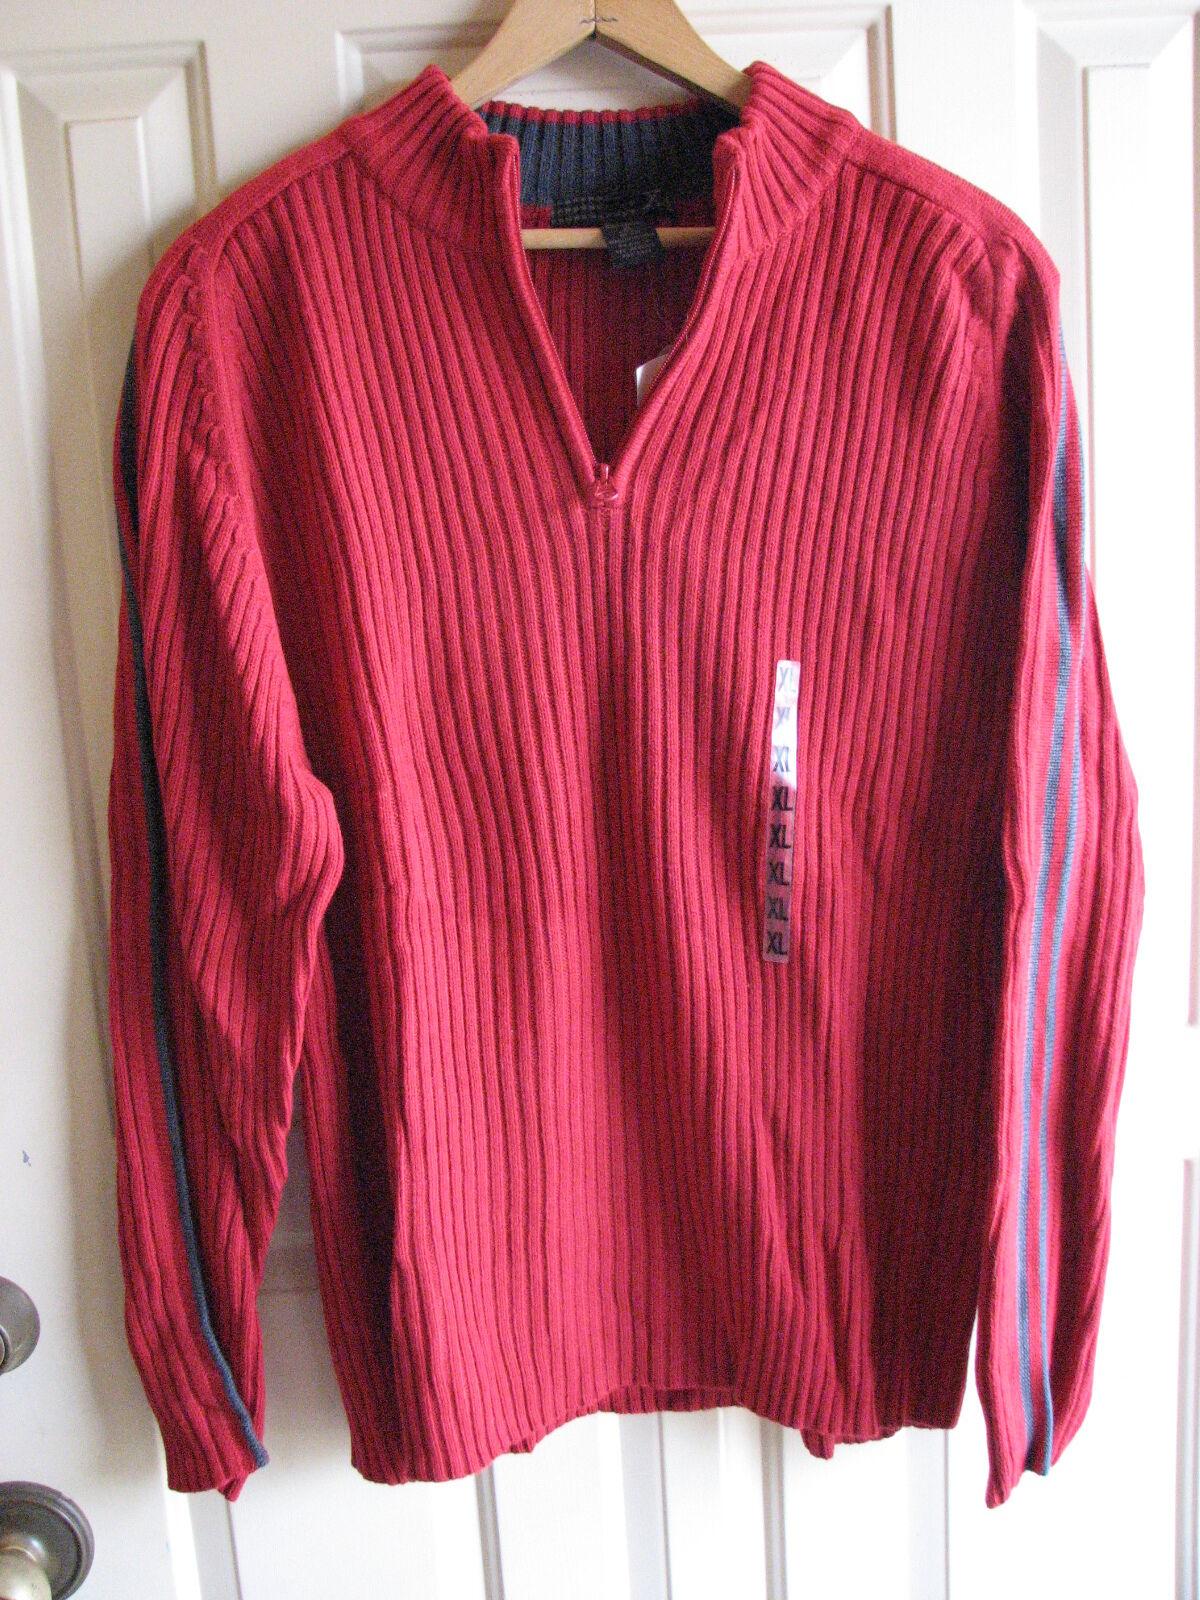 Chaps 1/4 Zip Red Sweater Boys XL 18-20 | eBay